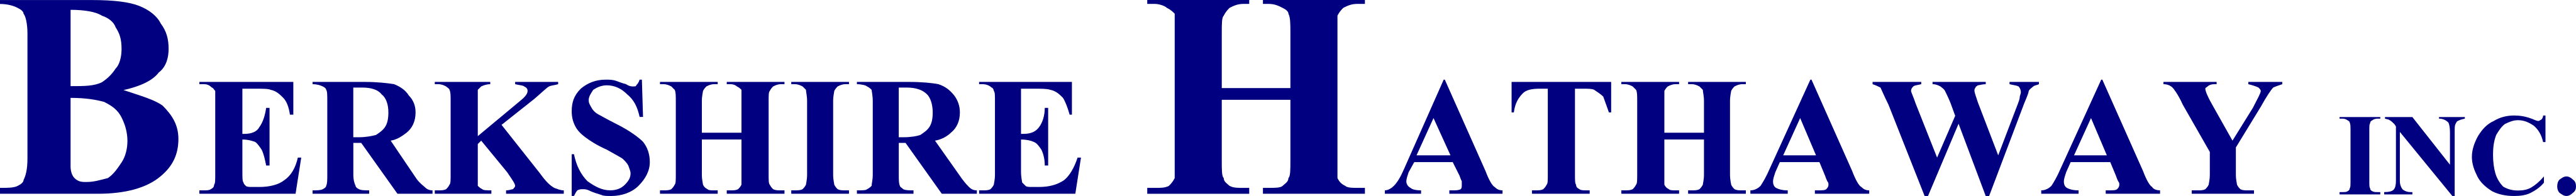 berkshire hathaway inc logo - Berkshire Hathaway Logo